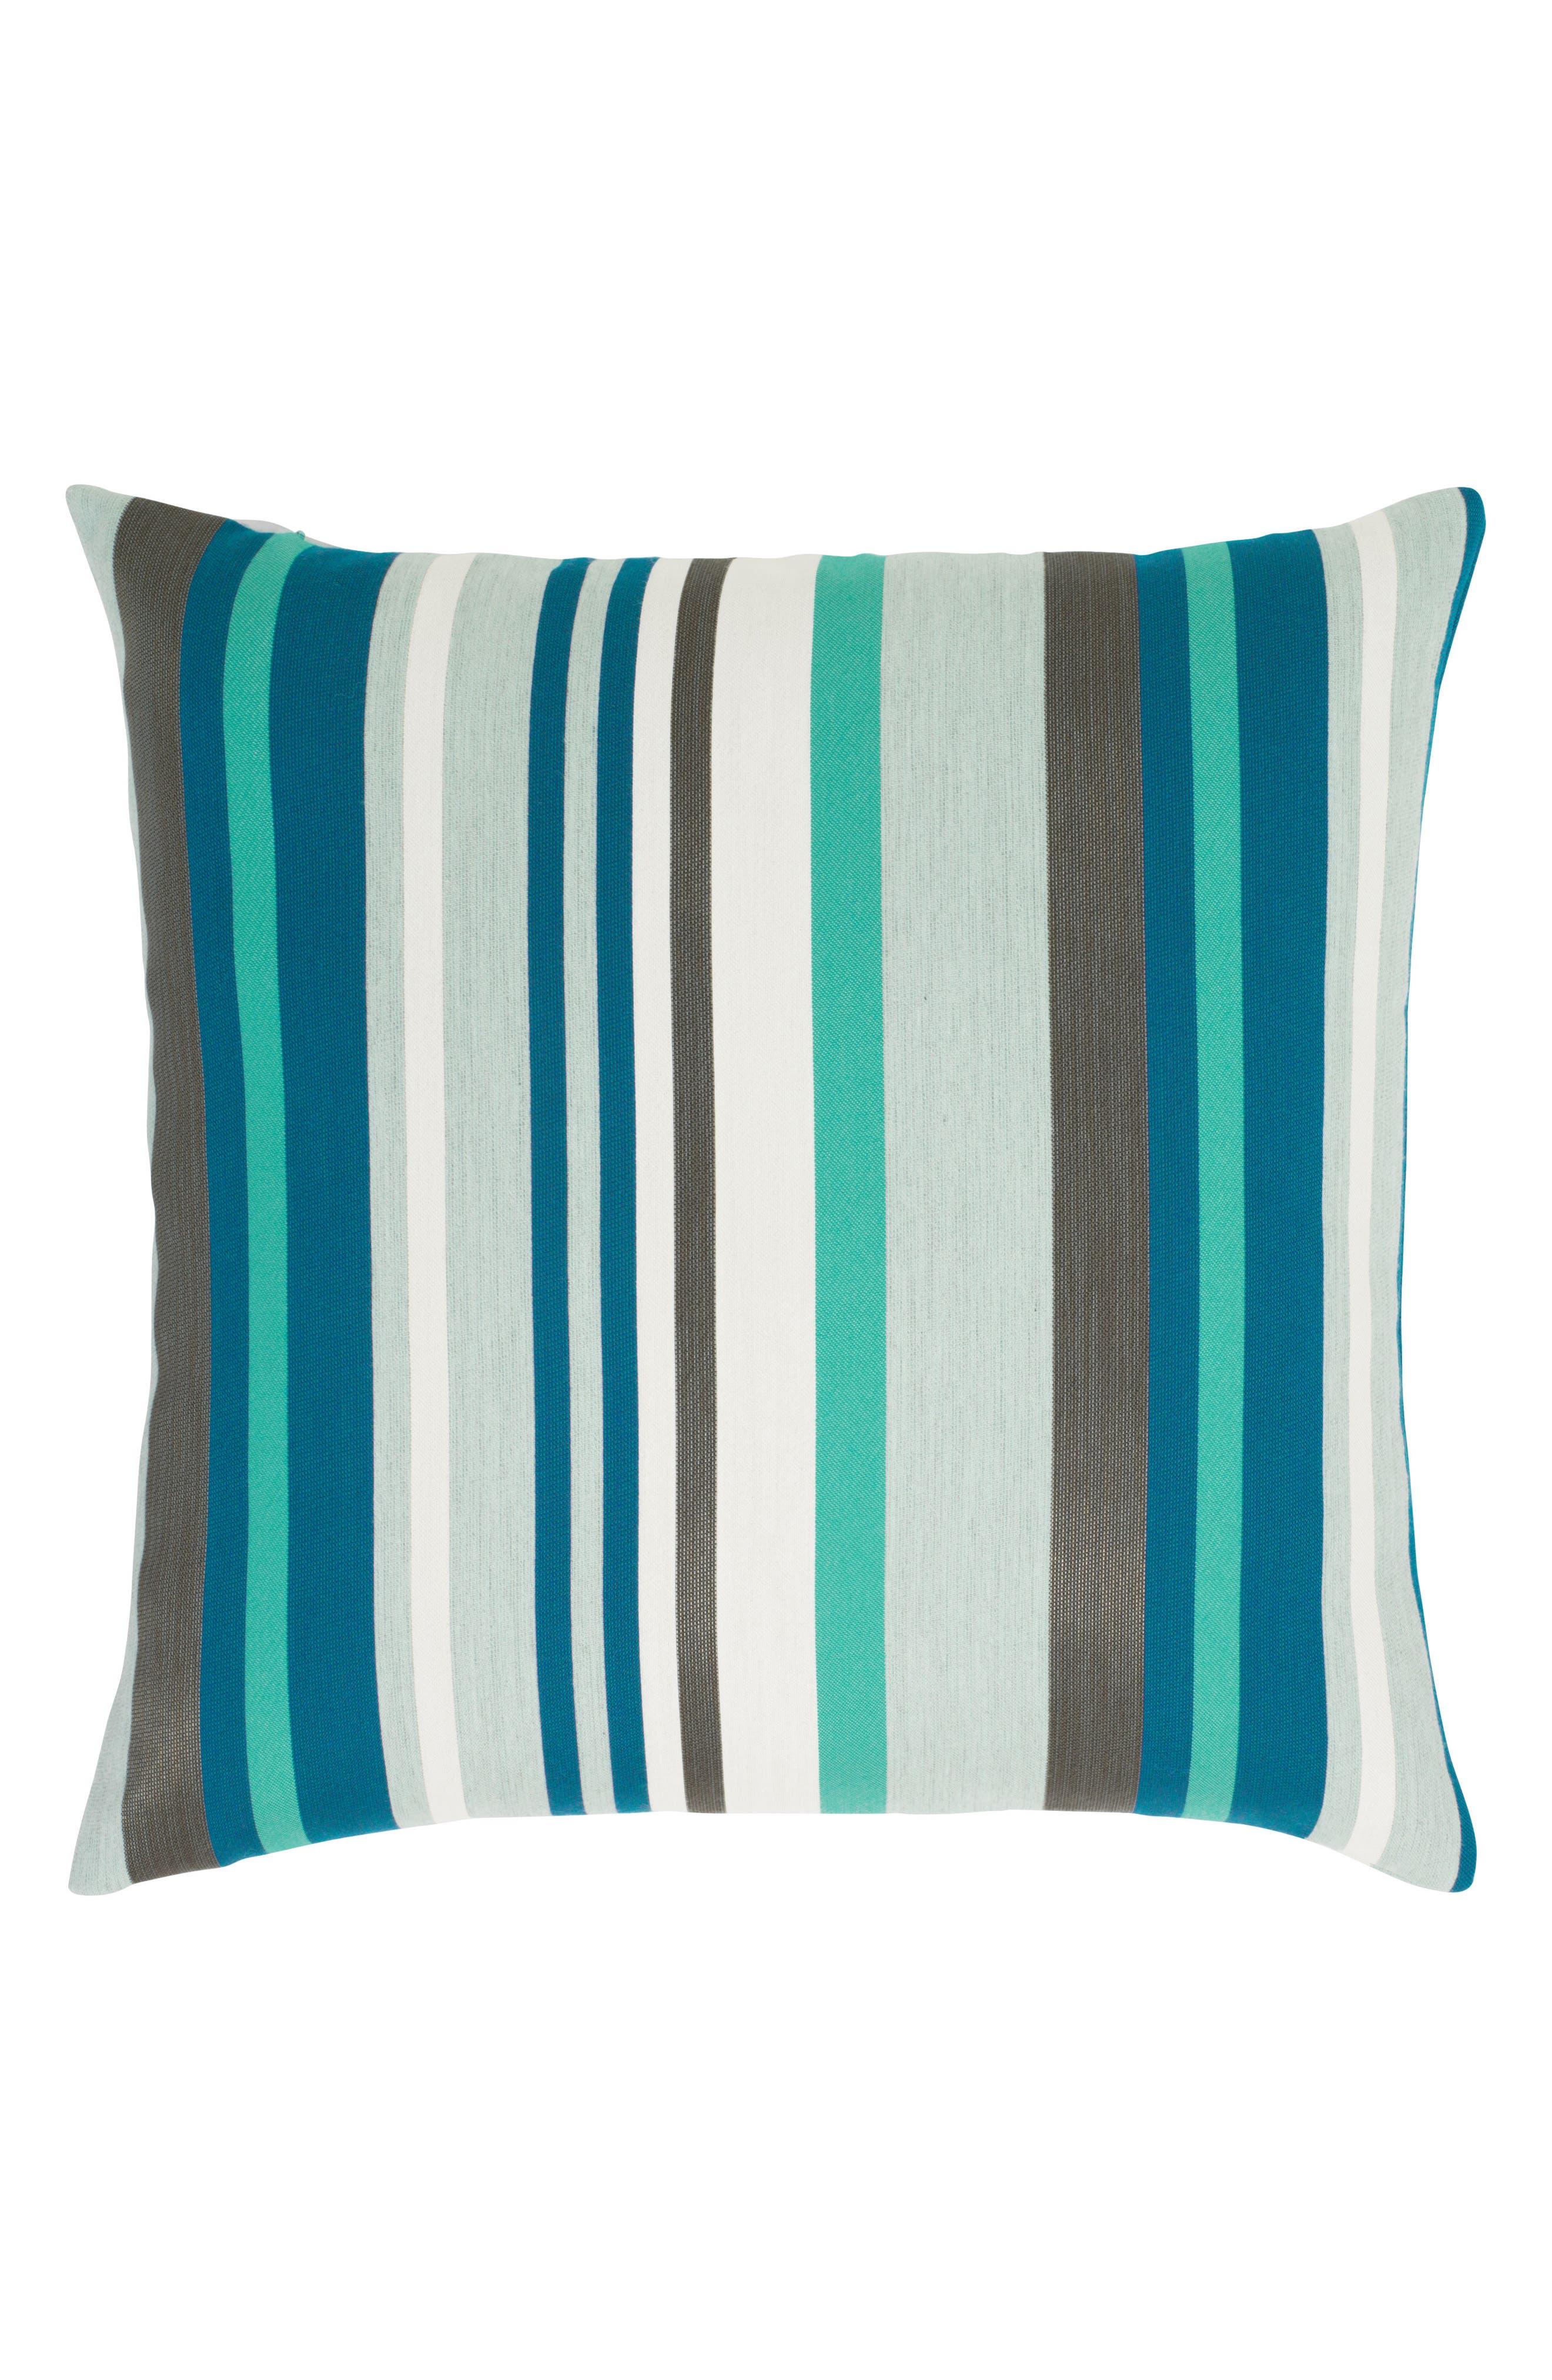 Elaine Smith Lagoon Stripe Indoor/Outdoor Accent Pillow